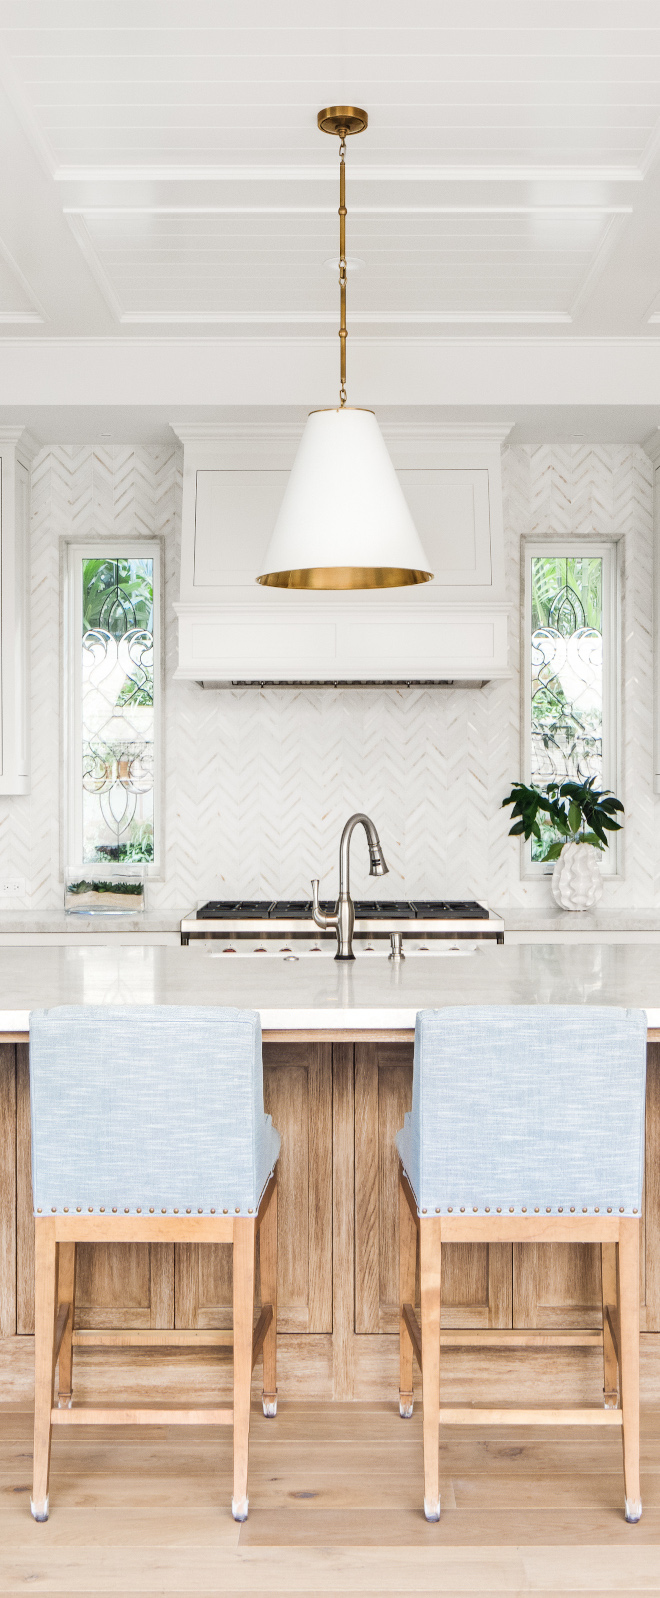 White-Kitchen-Hood-in-Benjamin-Moore-White-with-marble-backsplash-tile